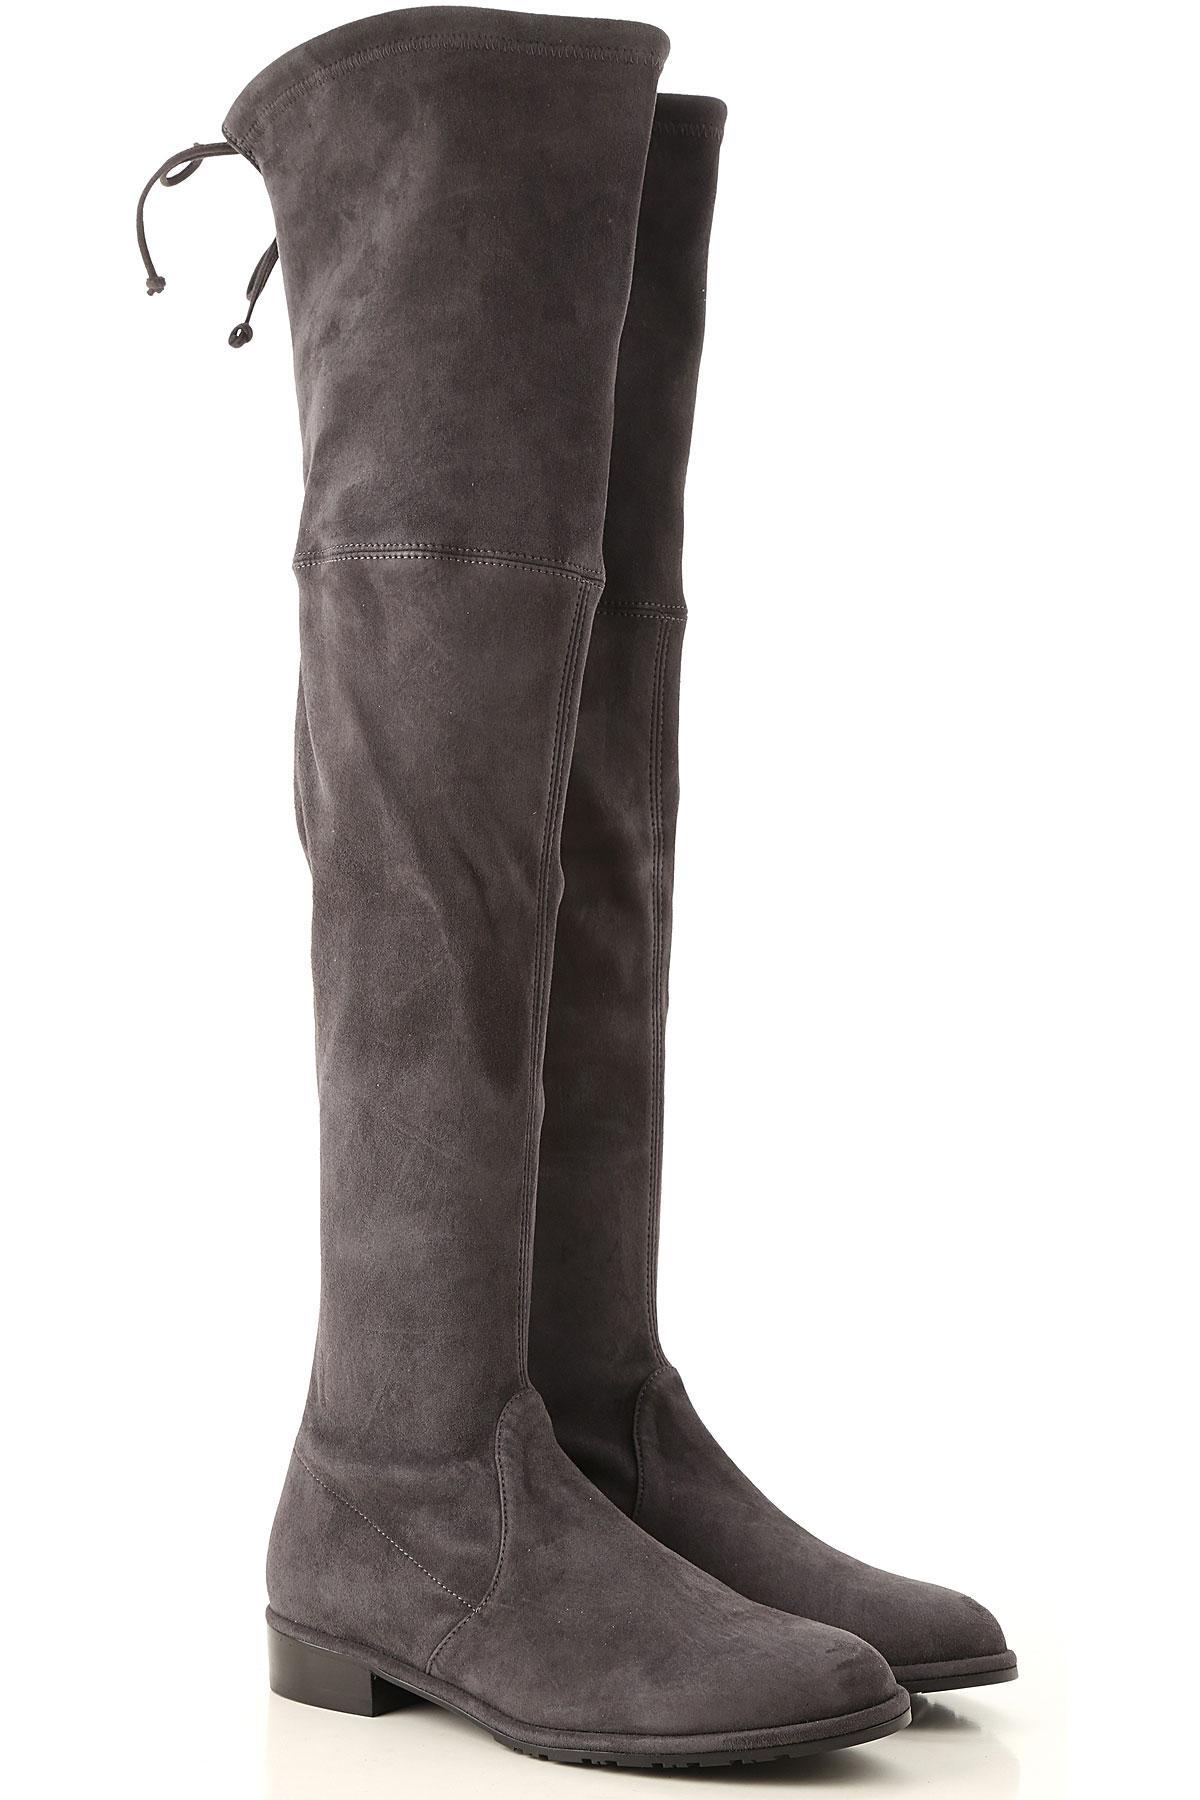 686645e5969 Lyst - Stuart Weitzman Boots For Women in Gray